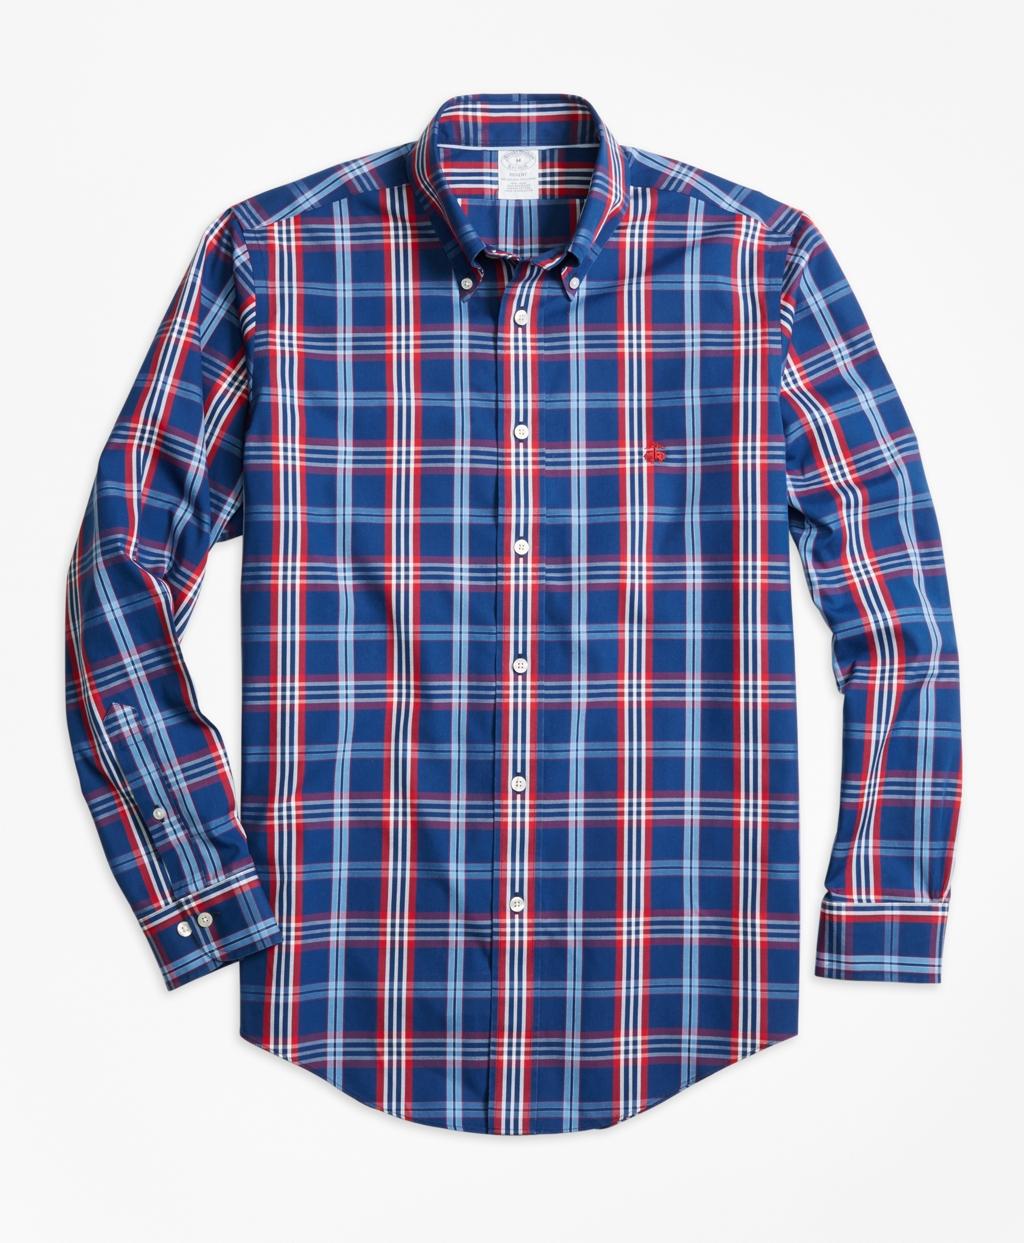 Brooks brothers non iron regent fit signature tartan sport for Brooks brothers non iron shirts review